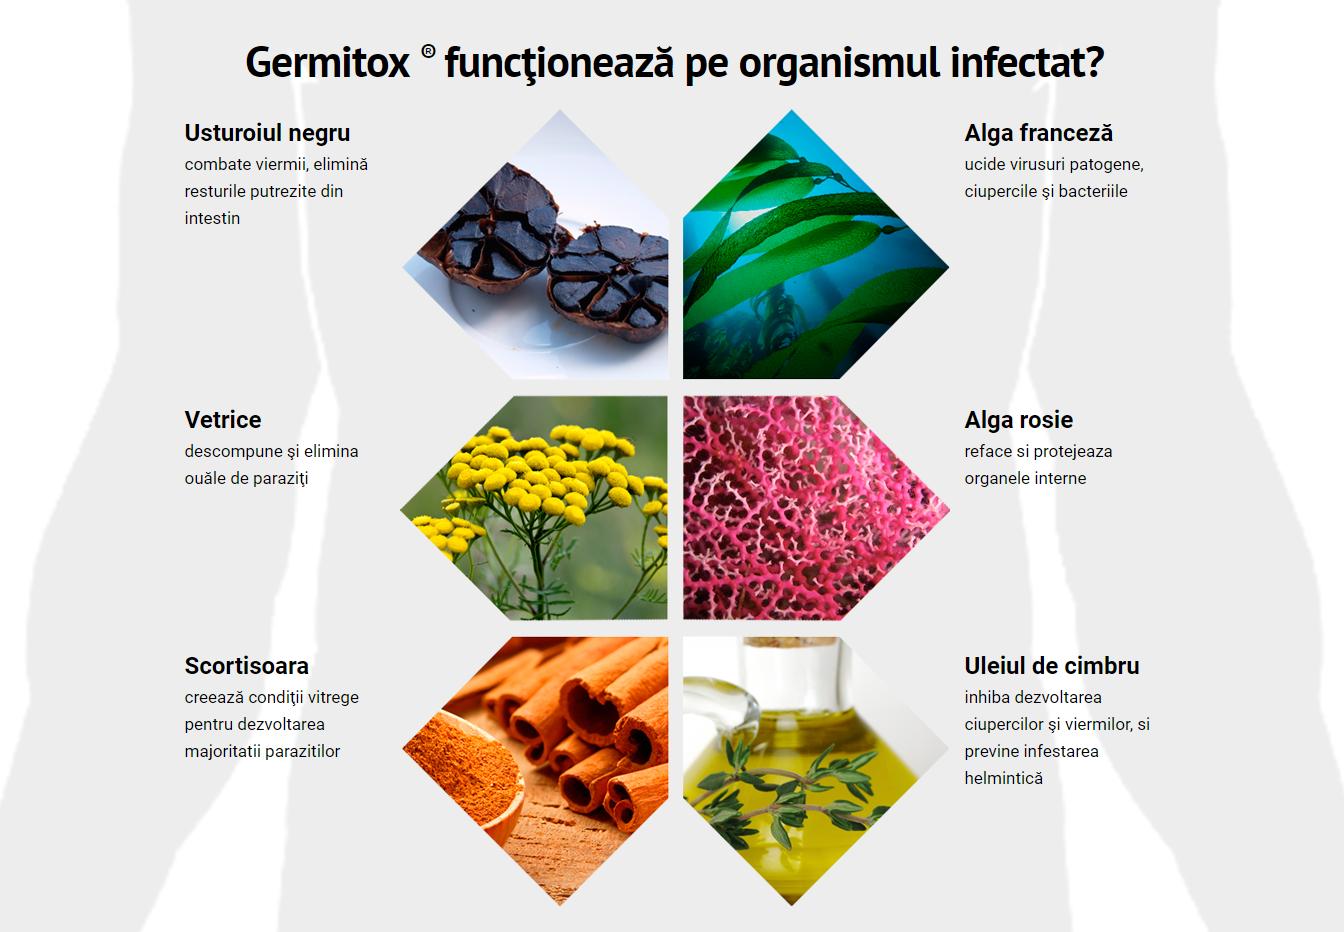 cum de a proteja împotriva paraziților intestinali papiloma virus humano verrugas genitales